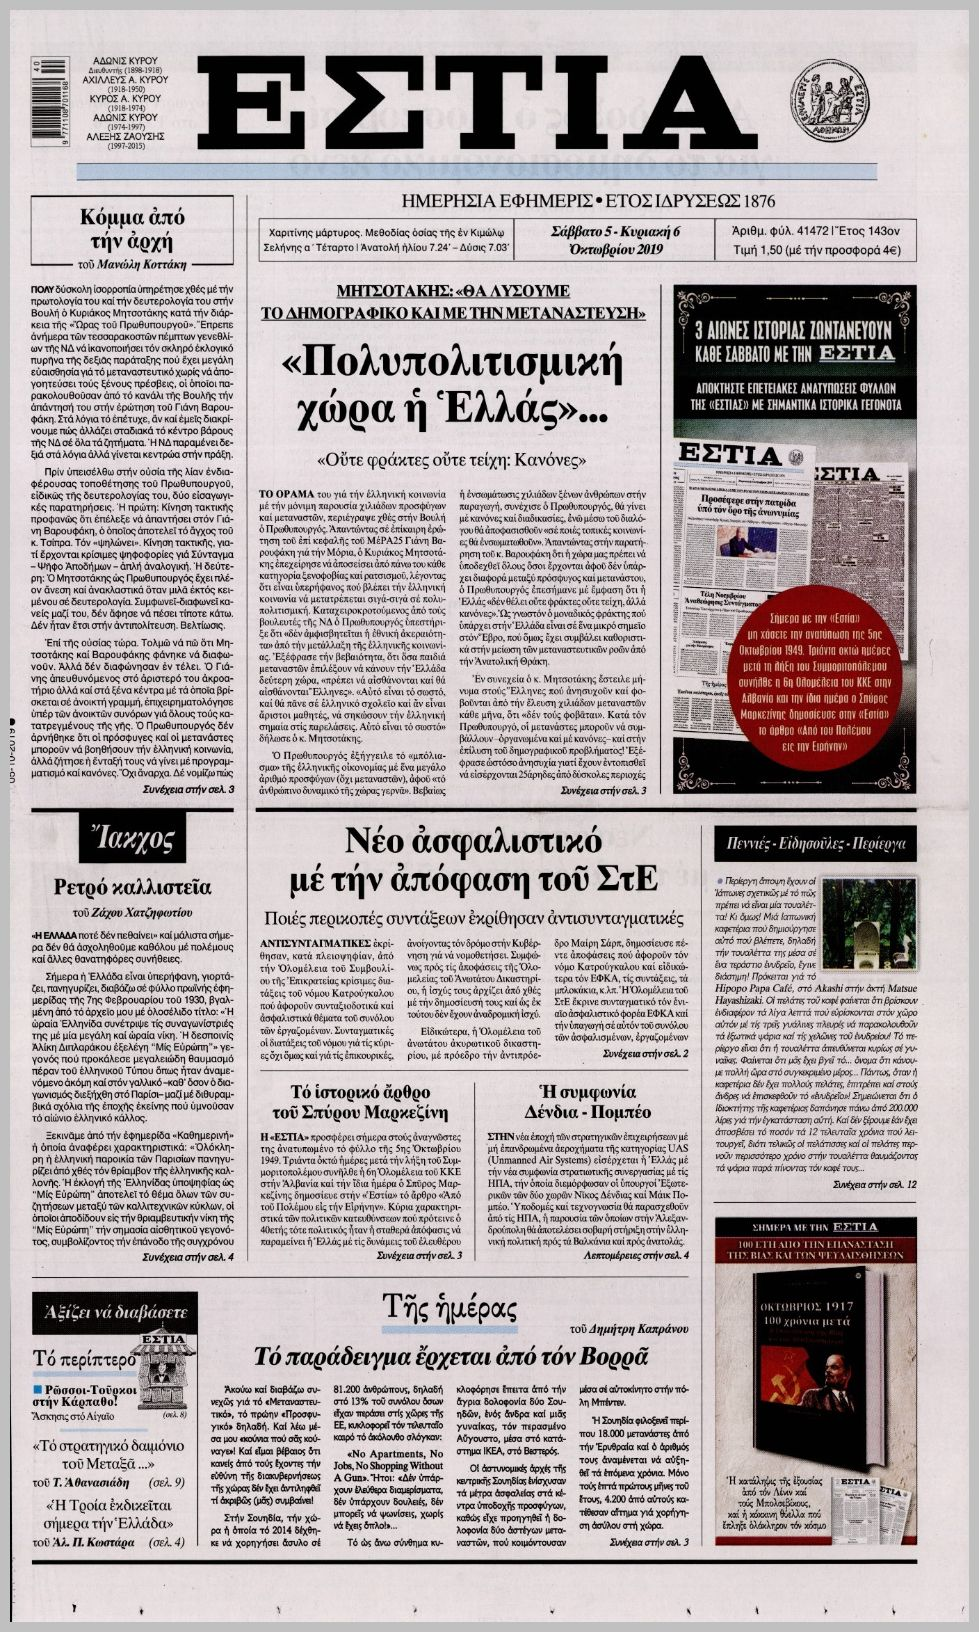 https://protoselida.24media.gr/images/2019/10/05/lrg/20191005_estia_0511.jpg